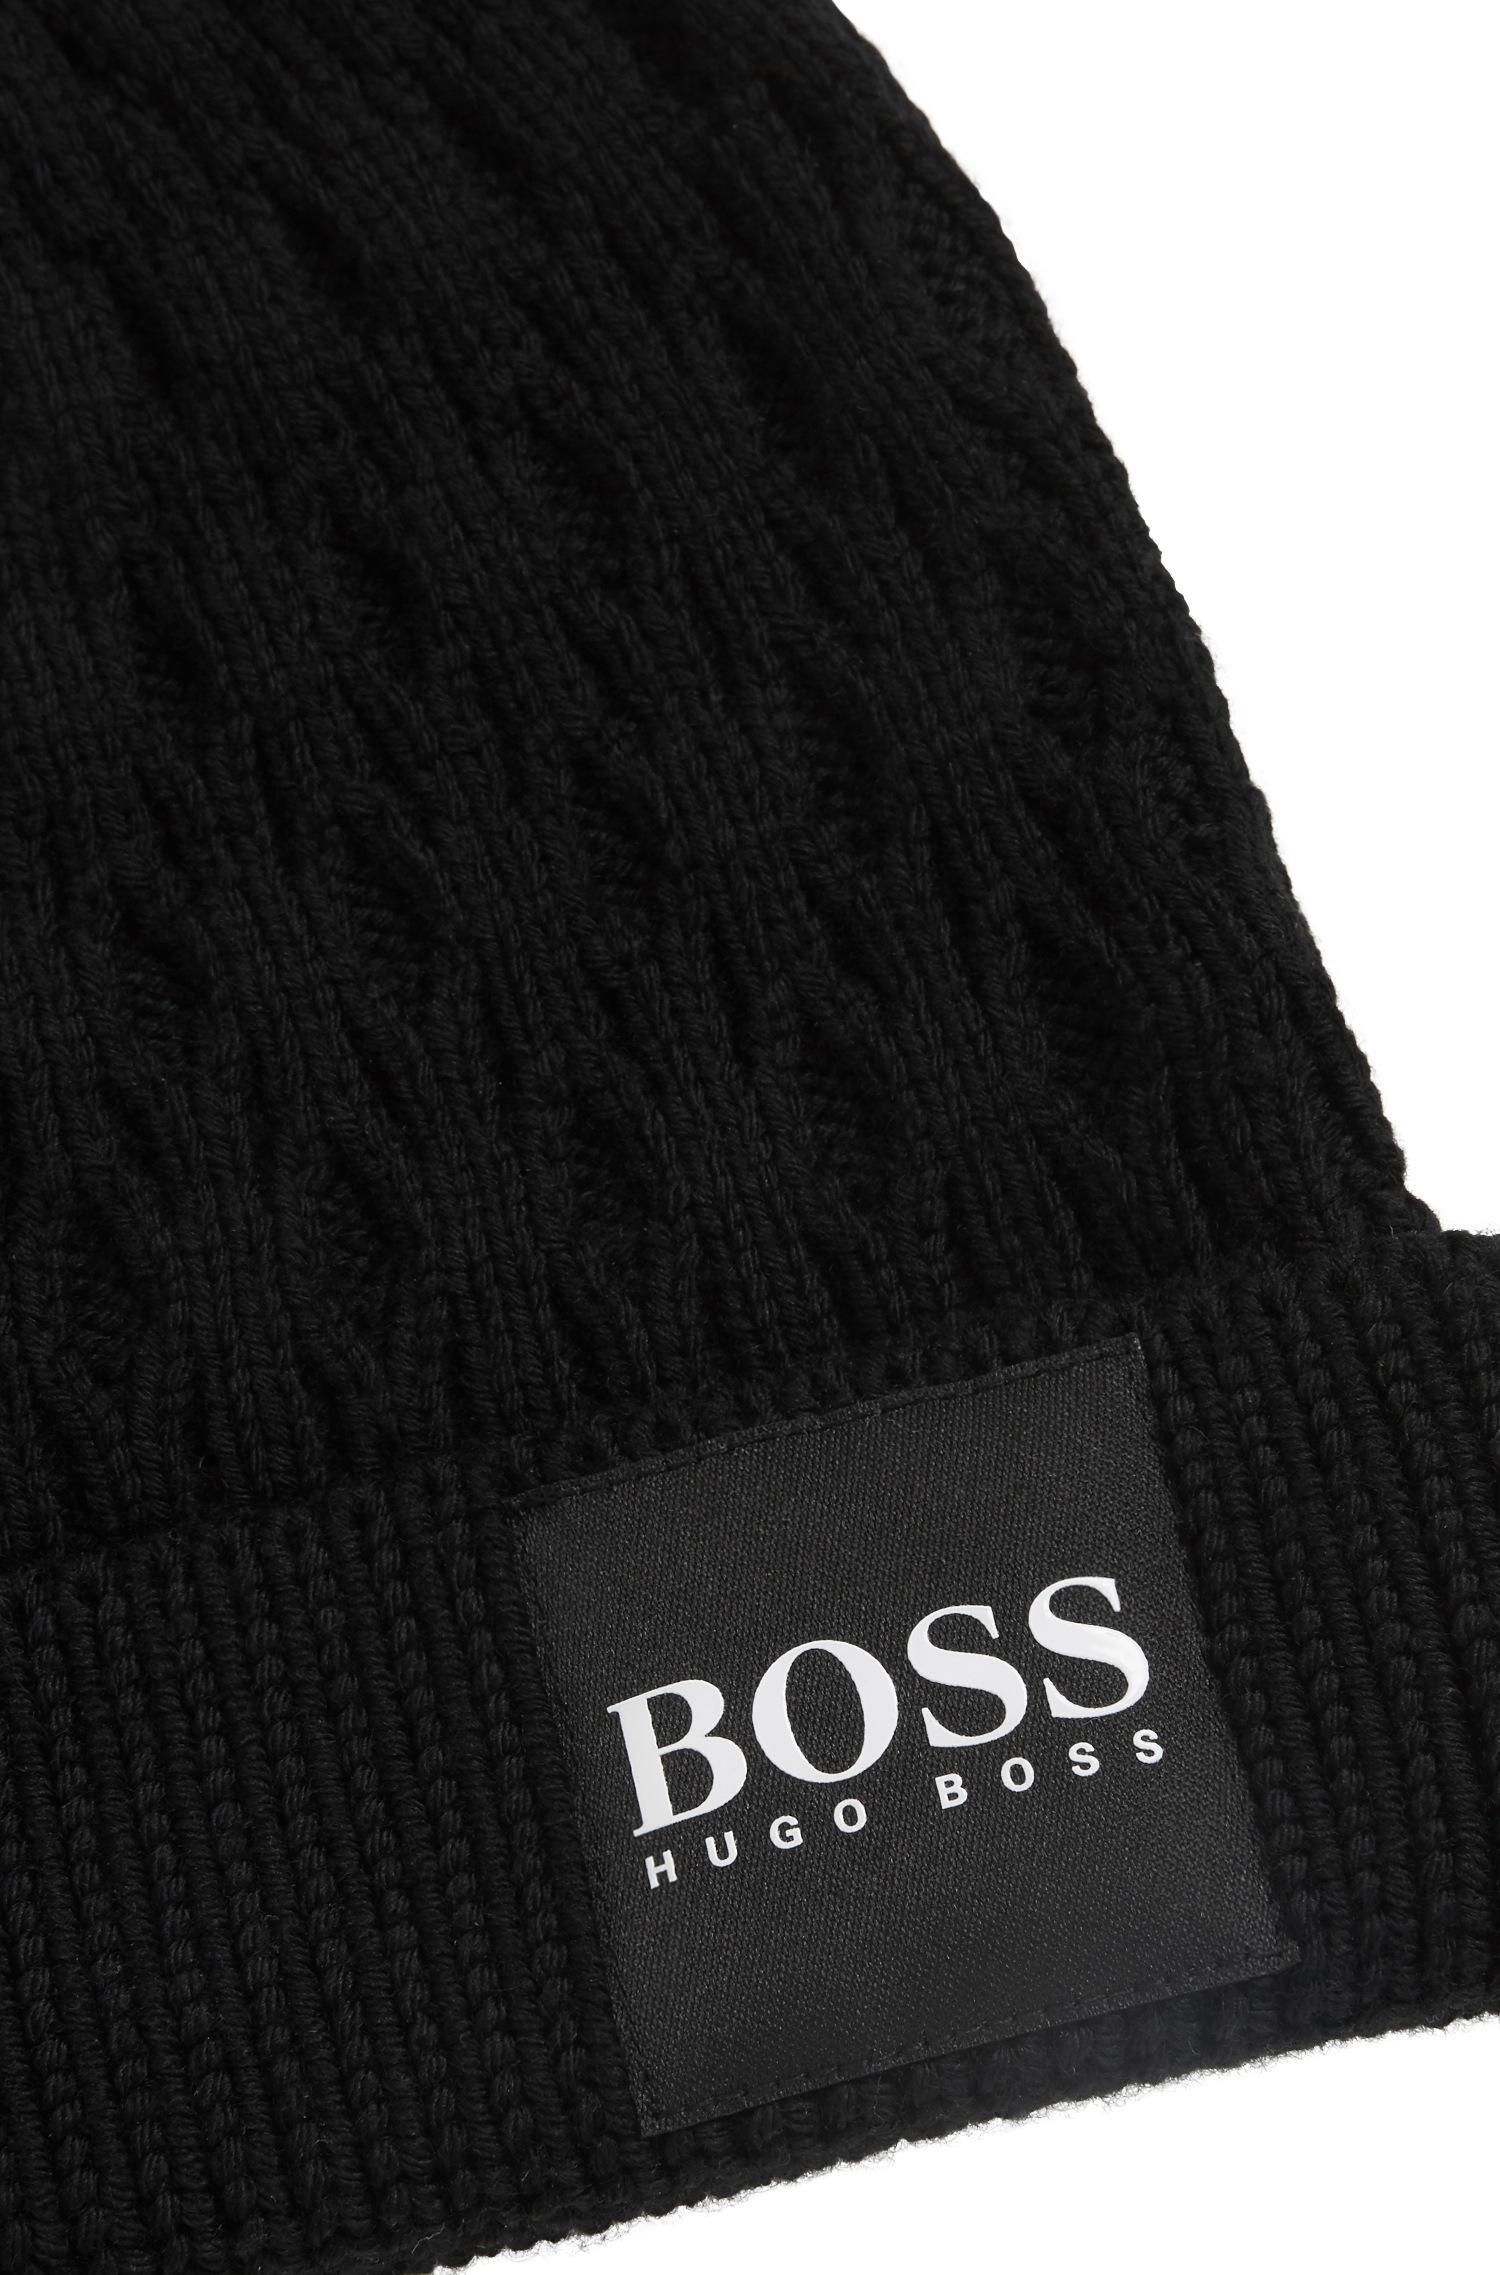 c4747e44da6d6 BOSS Knitted Beanie Hat In Structured Virgin Wool in Black for Men ...